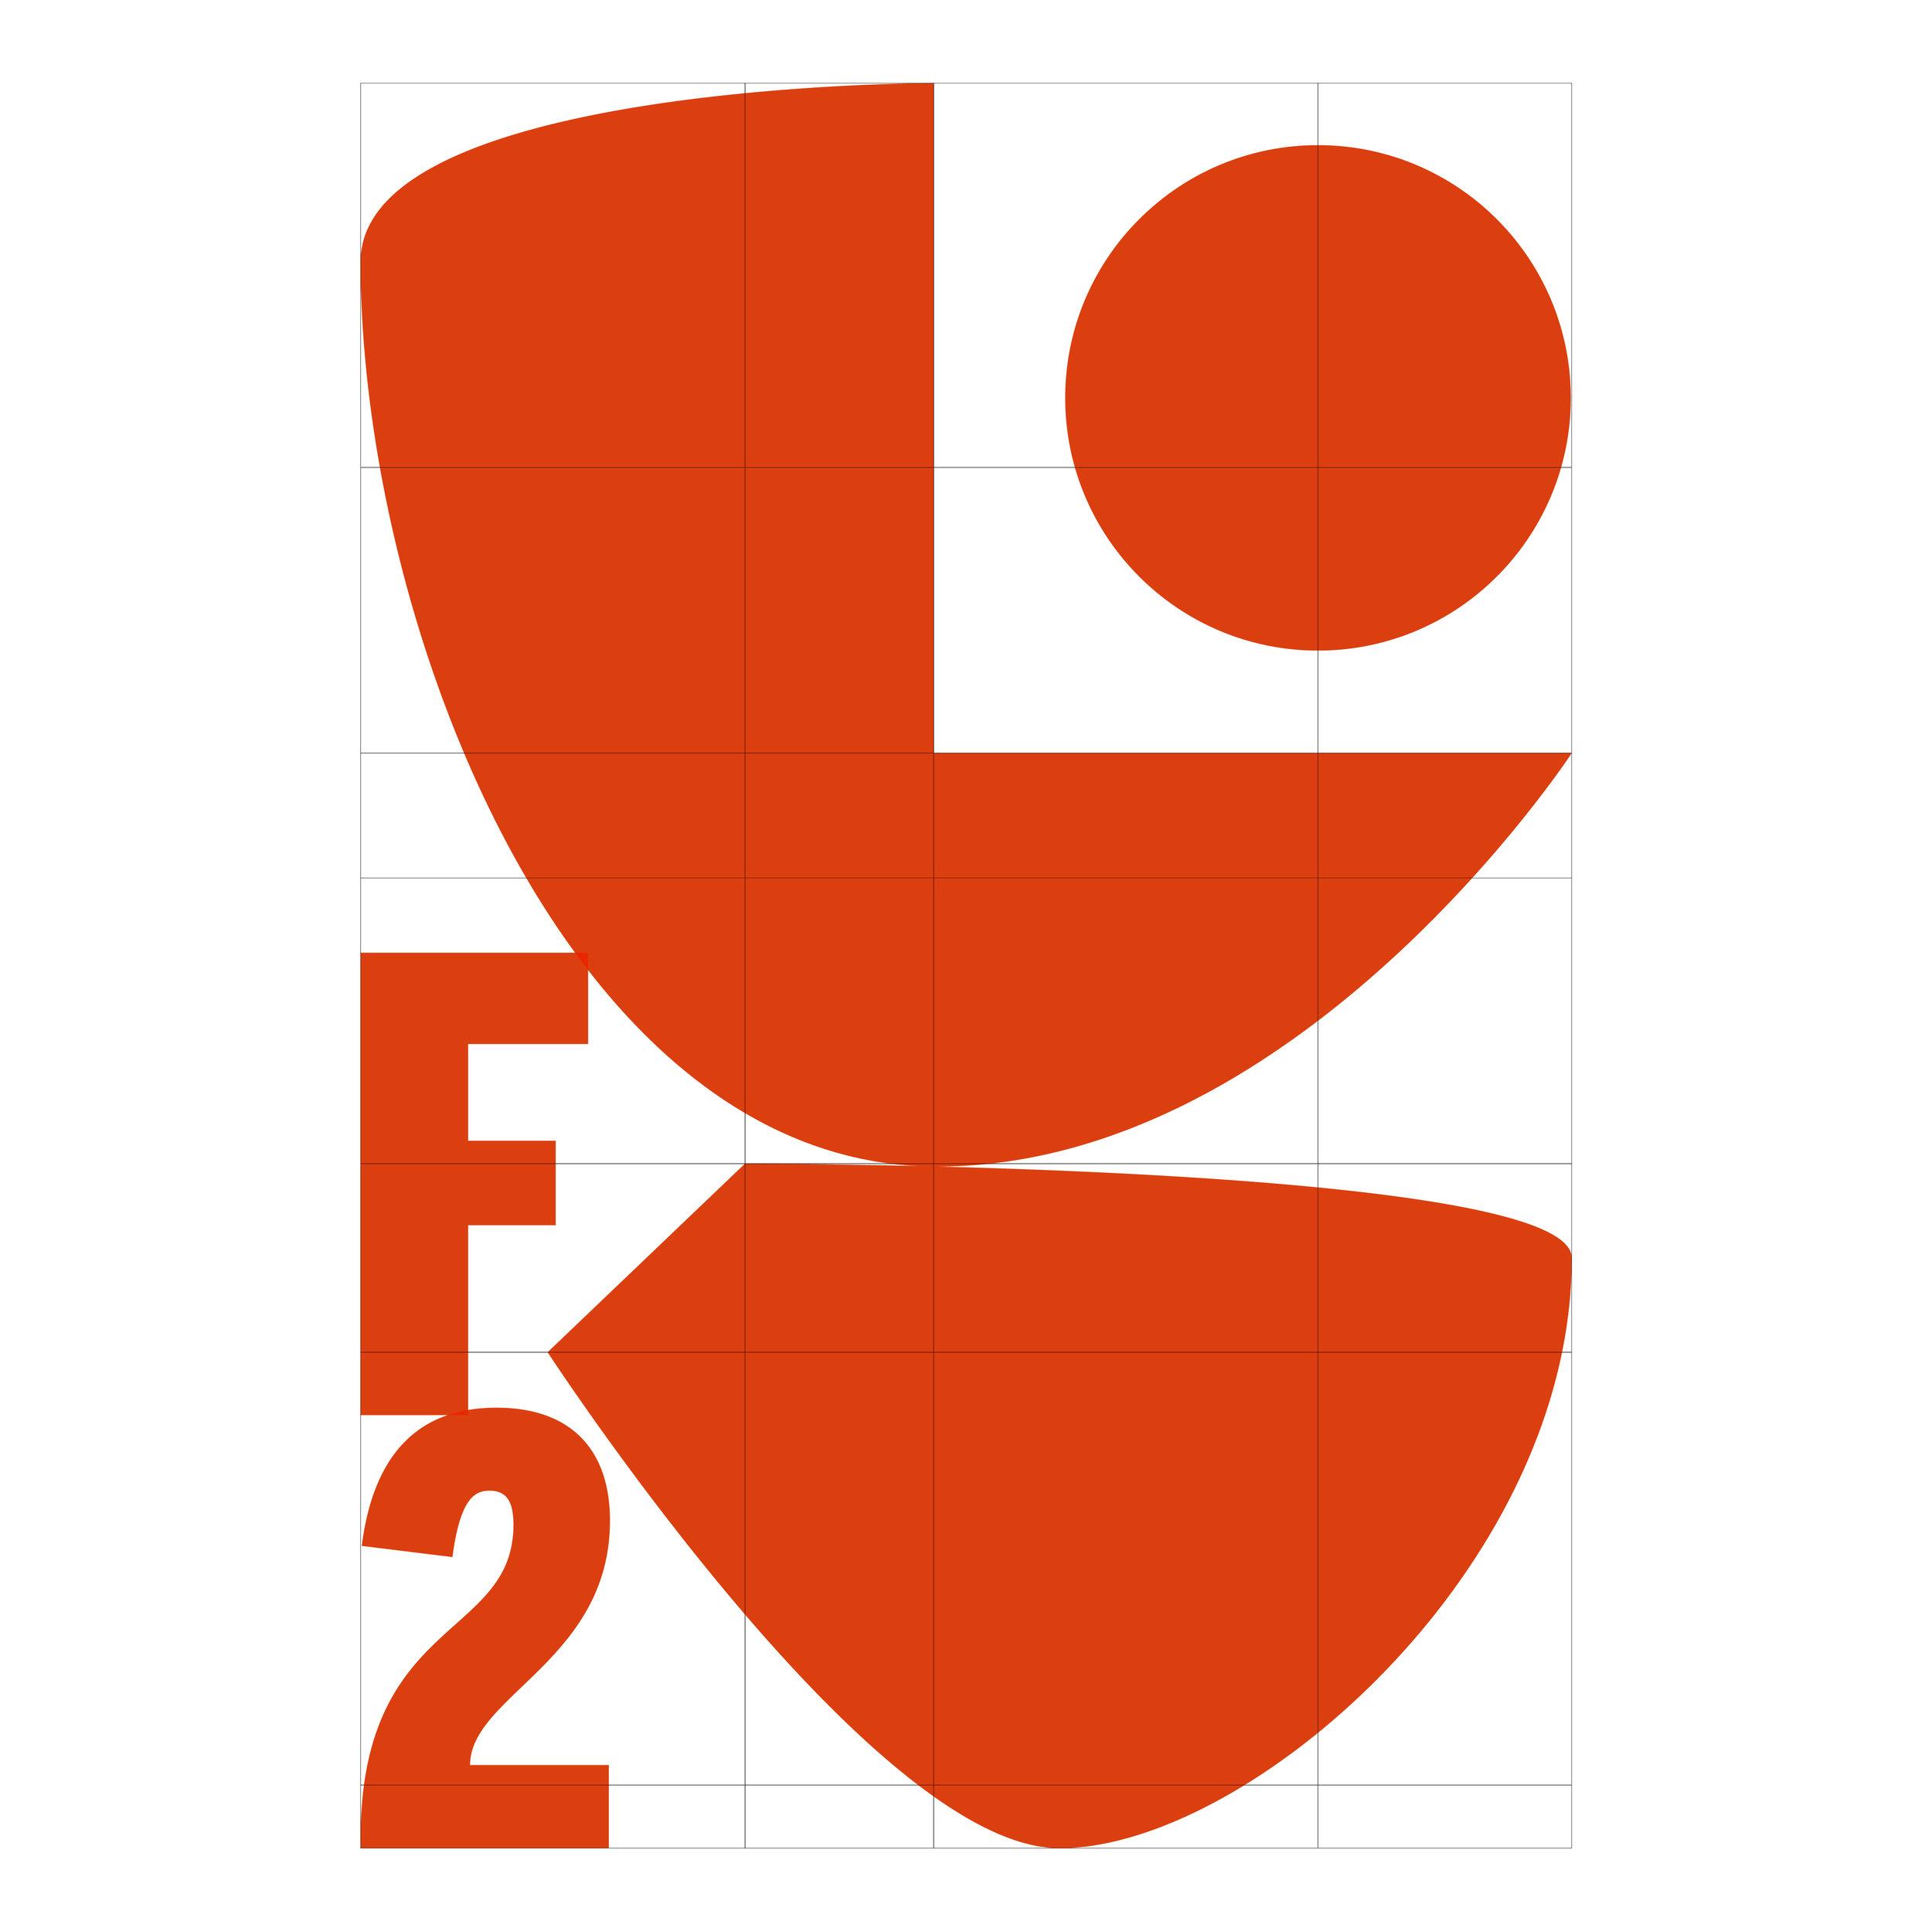 Letters_Grids-06.jpg